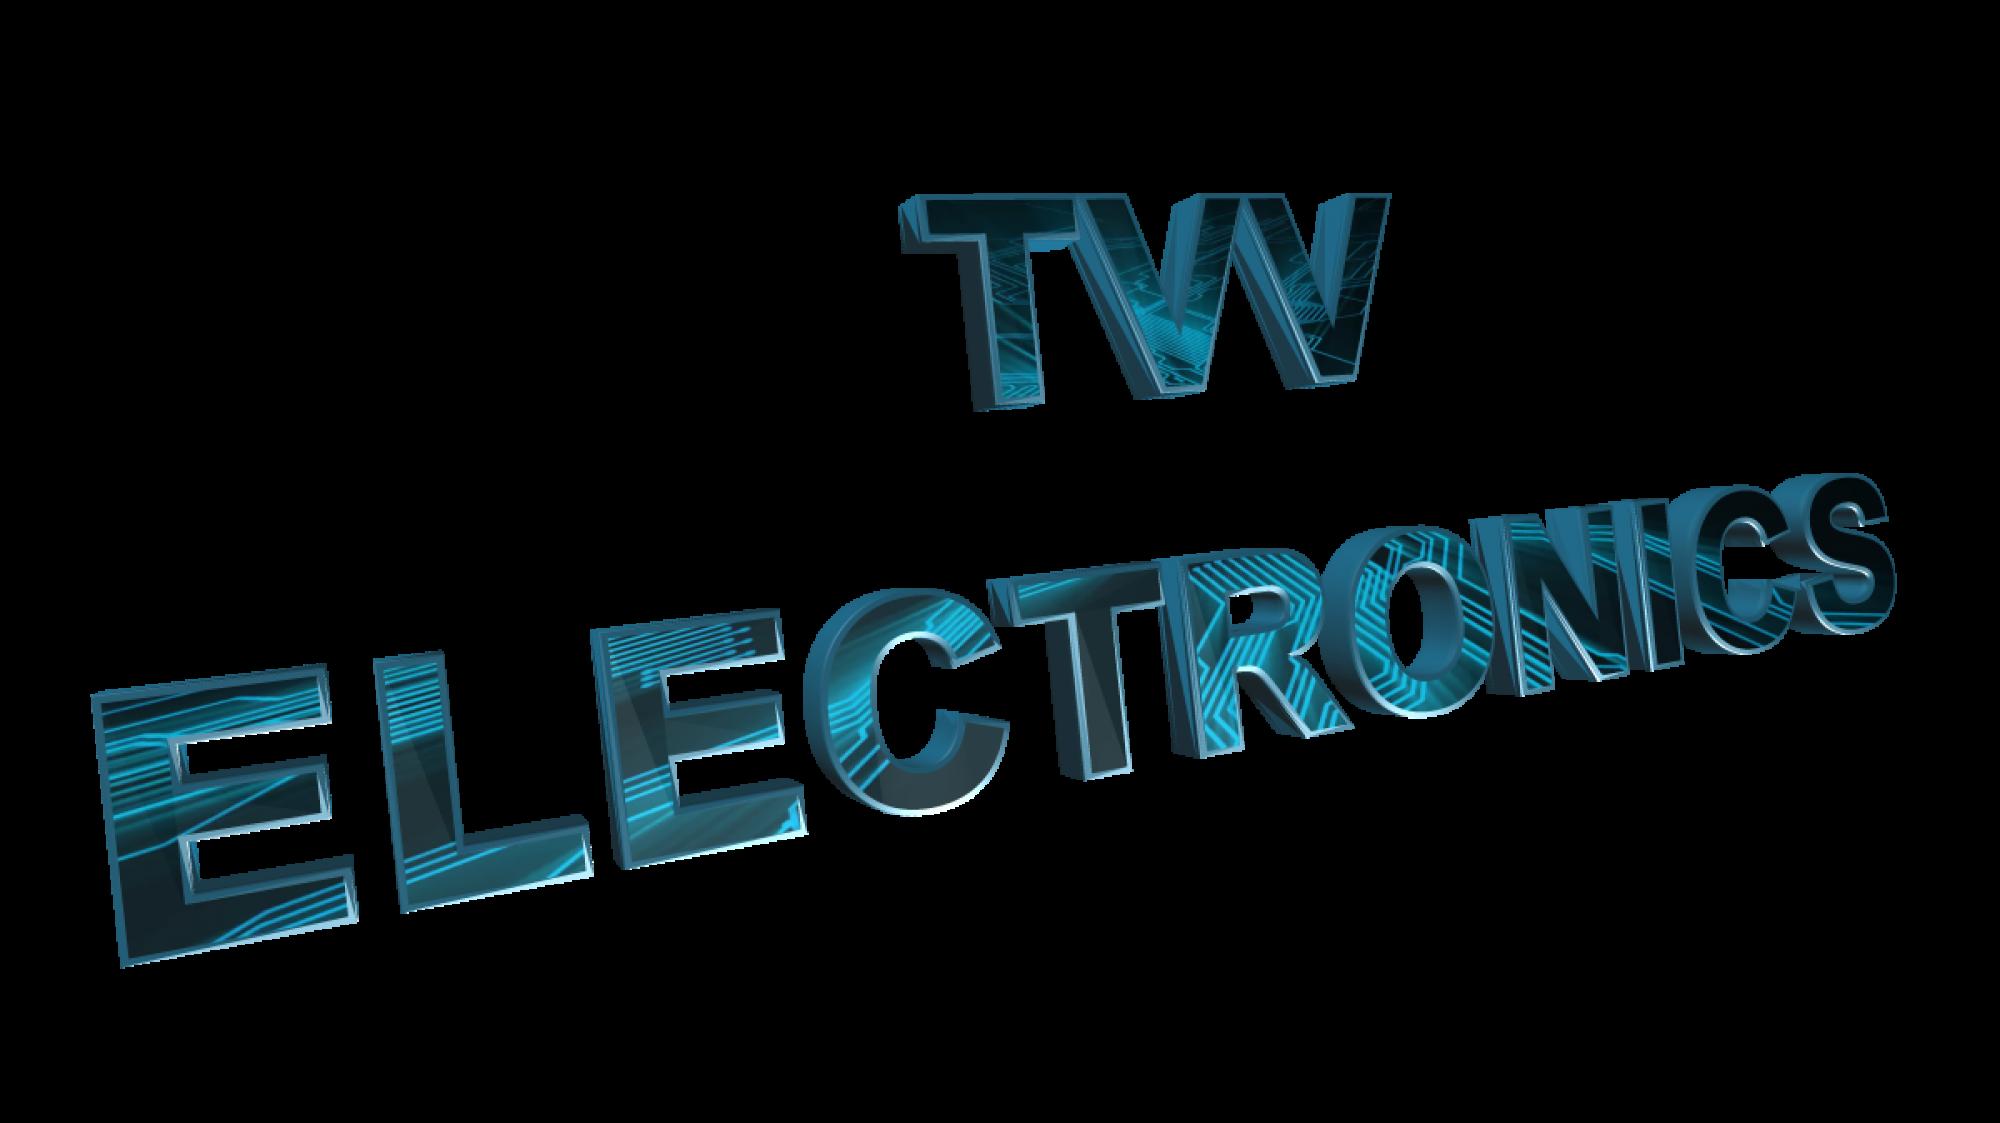 TVV ELECTRONICS